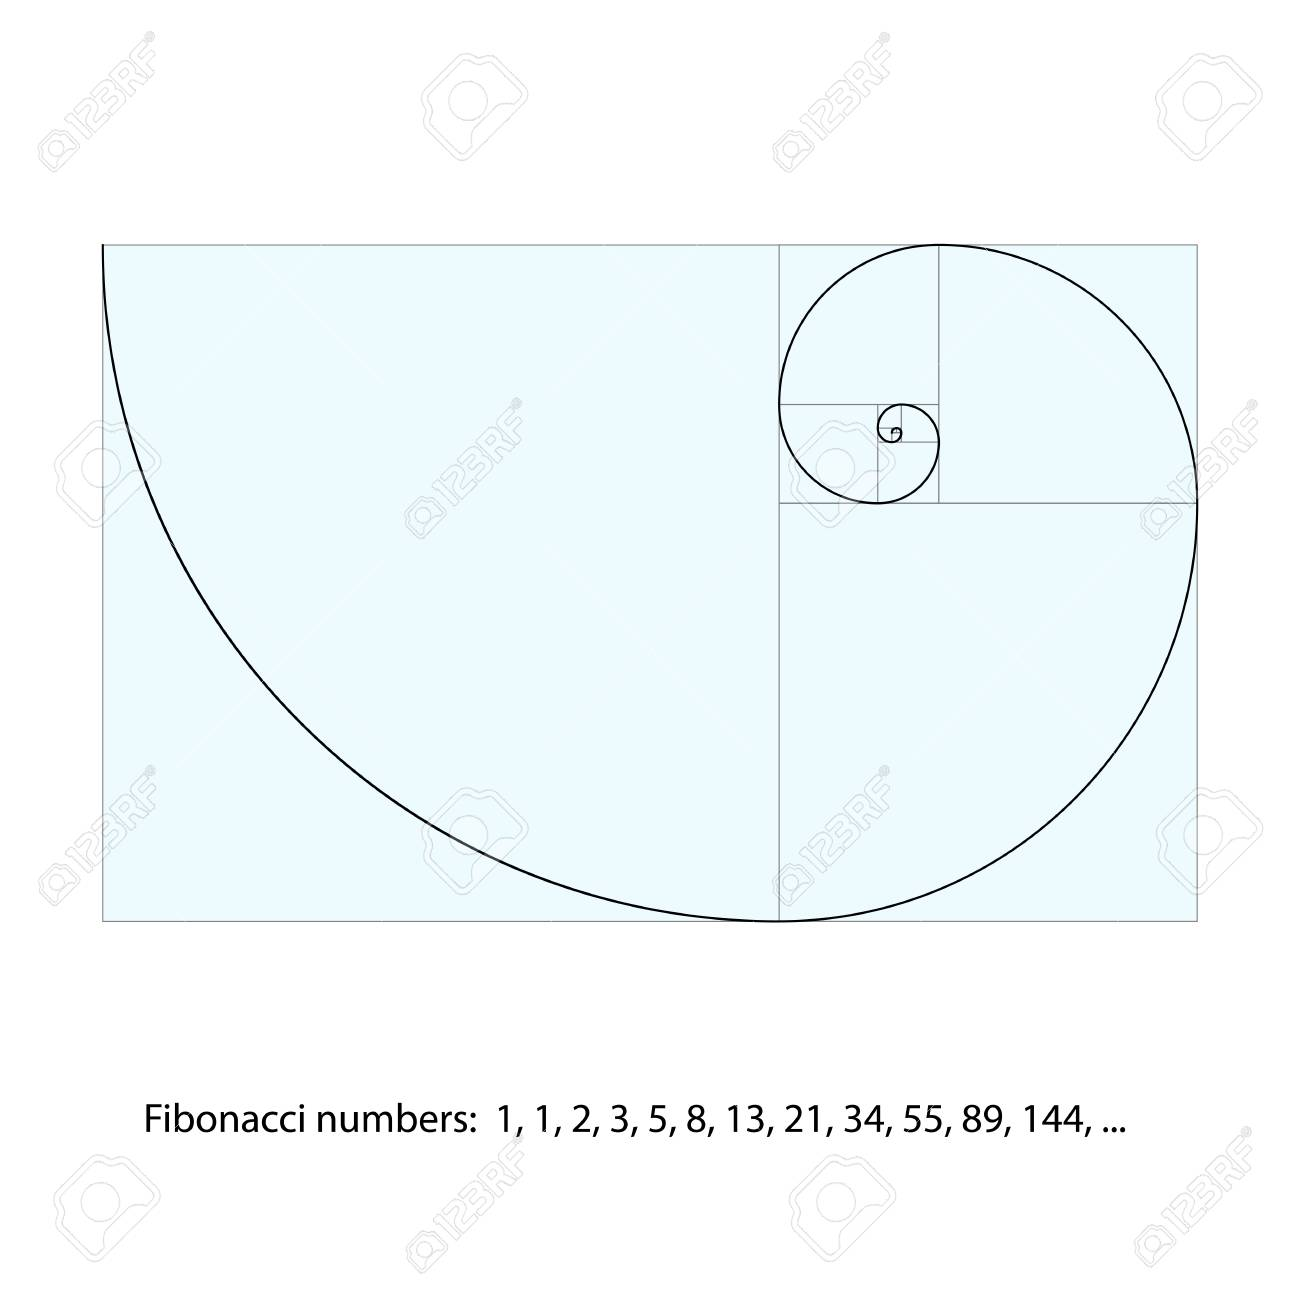 golden ratio template fibonacci spiral vector illustration numbers